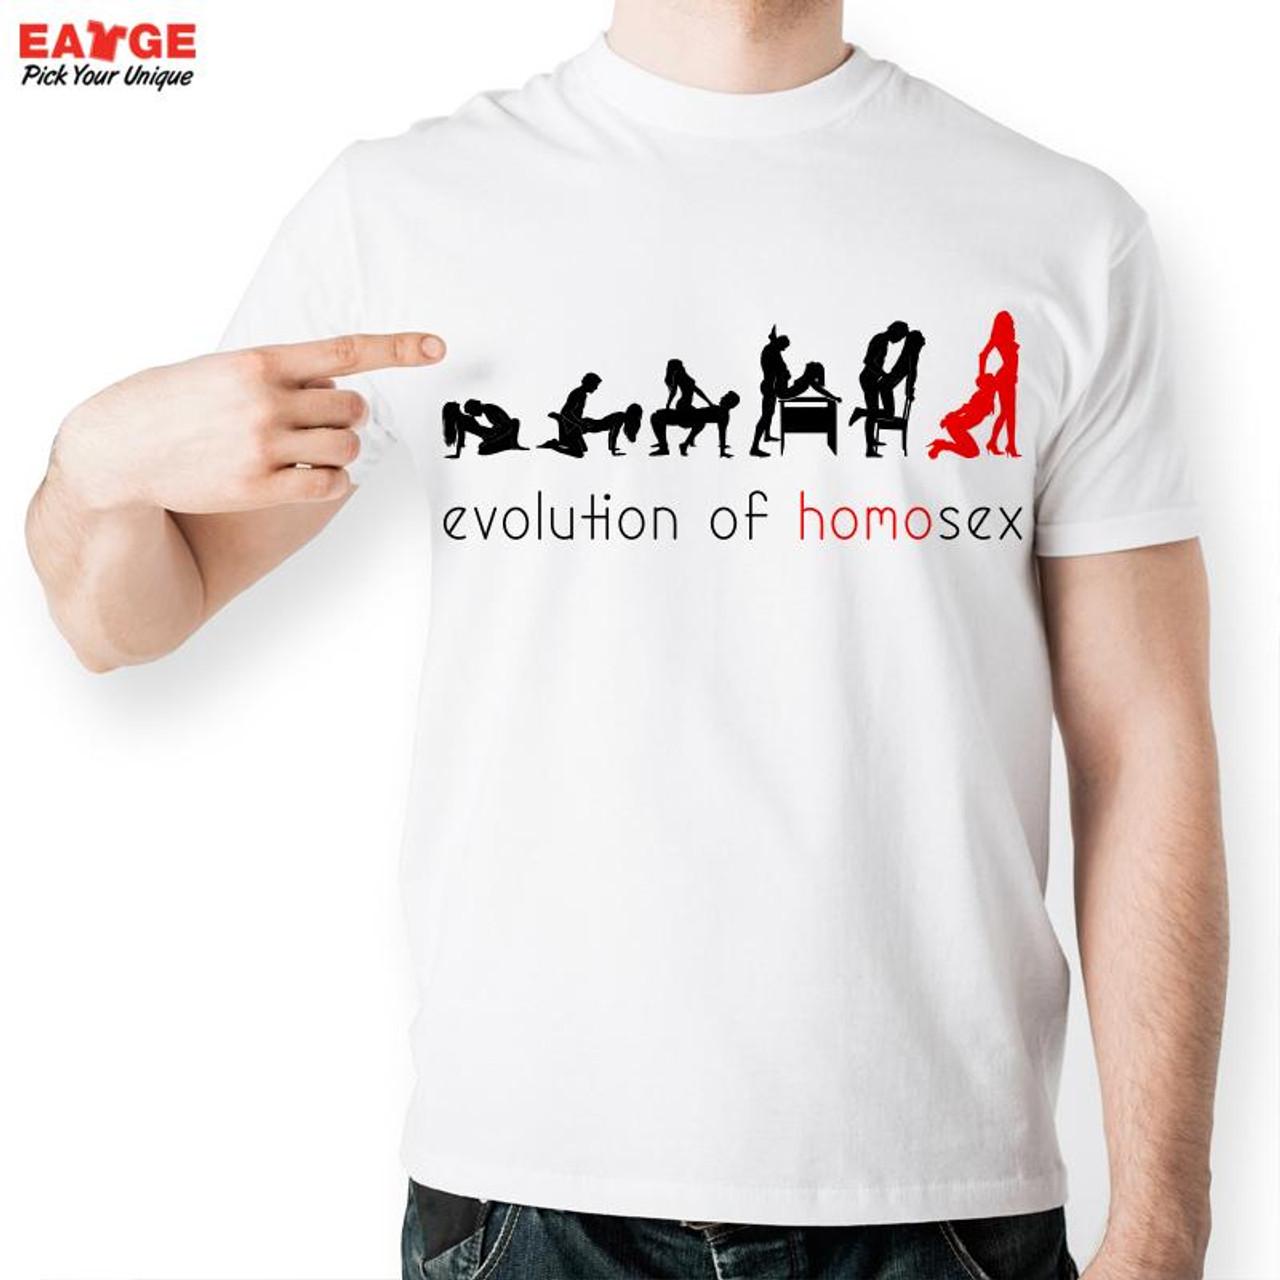 New Men Sexy Design T Shirt Fashion White Print Short Sleeve O Neck Sex Love Evolution Boy T Shirt Funny Homo Summer T Shirts Onshopdeals Com